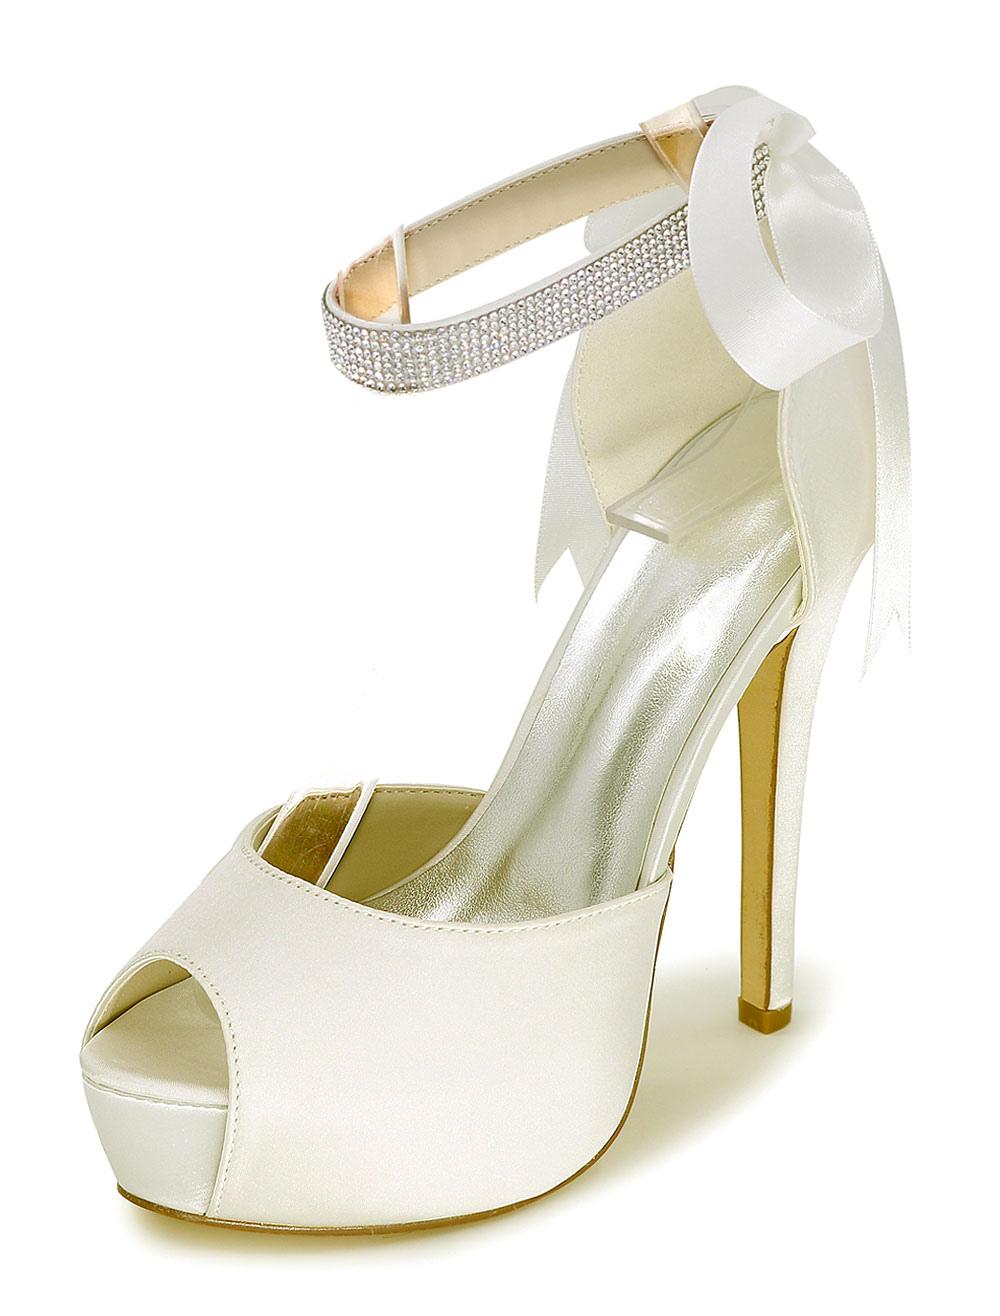 Peep Wedding Shoes Platform Sandals Women's High Heel Ankle Strap Rhinestones Satin Bridal Shoes